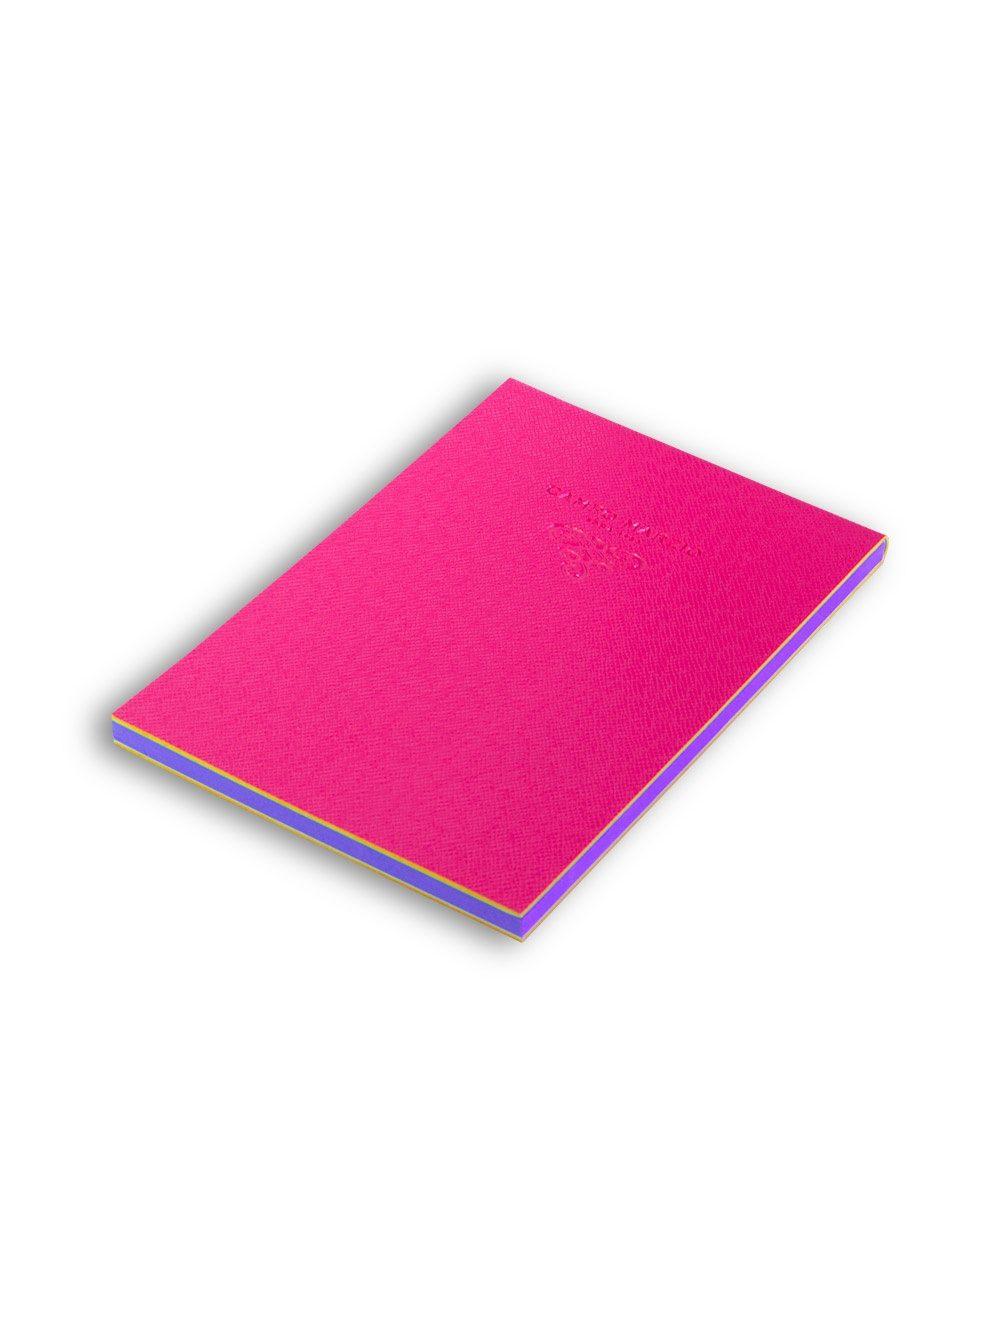 Notes 11x16 cm Saffiano - Hot Pink